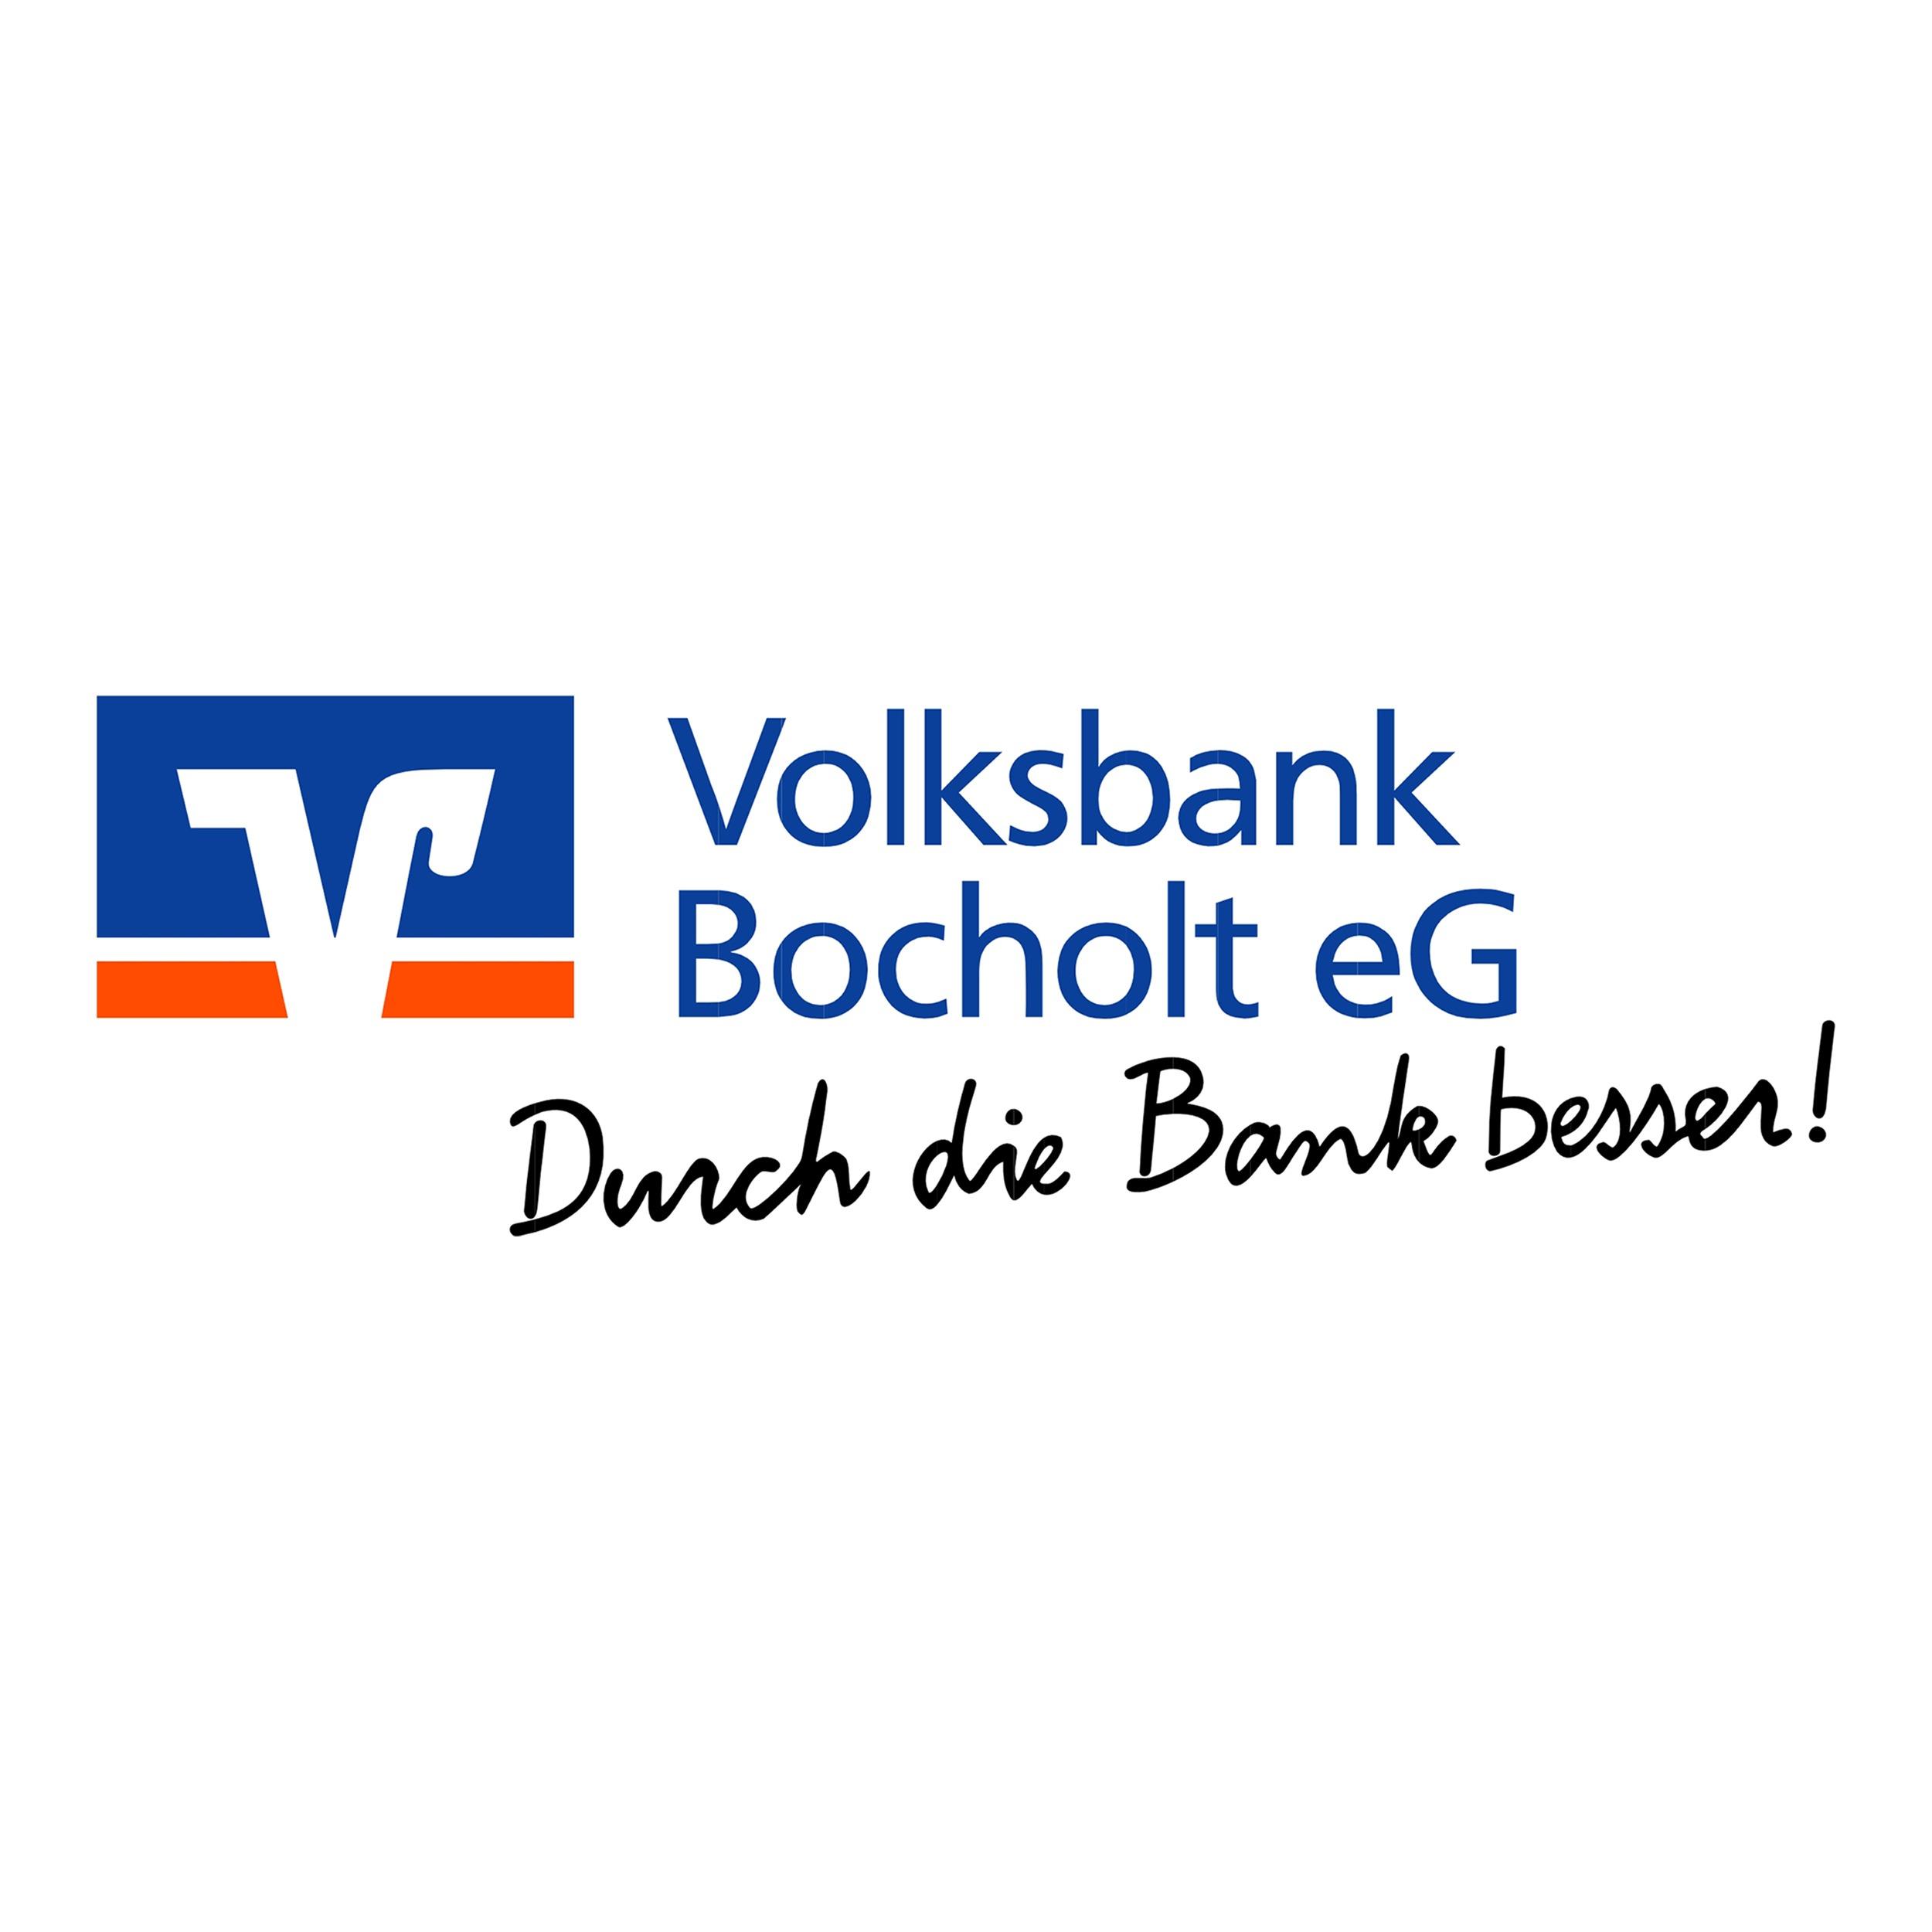 Bocholt800_Platin-Volksbank-Bocholt_20210811